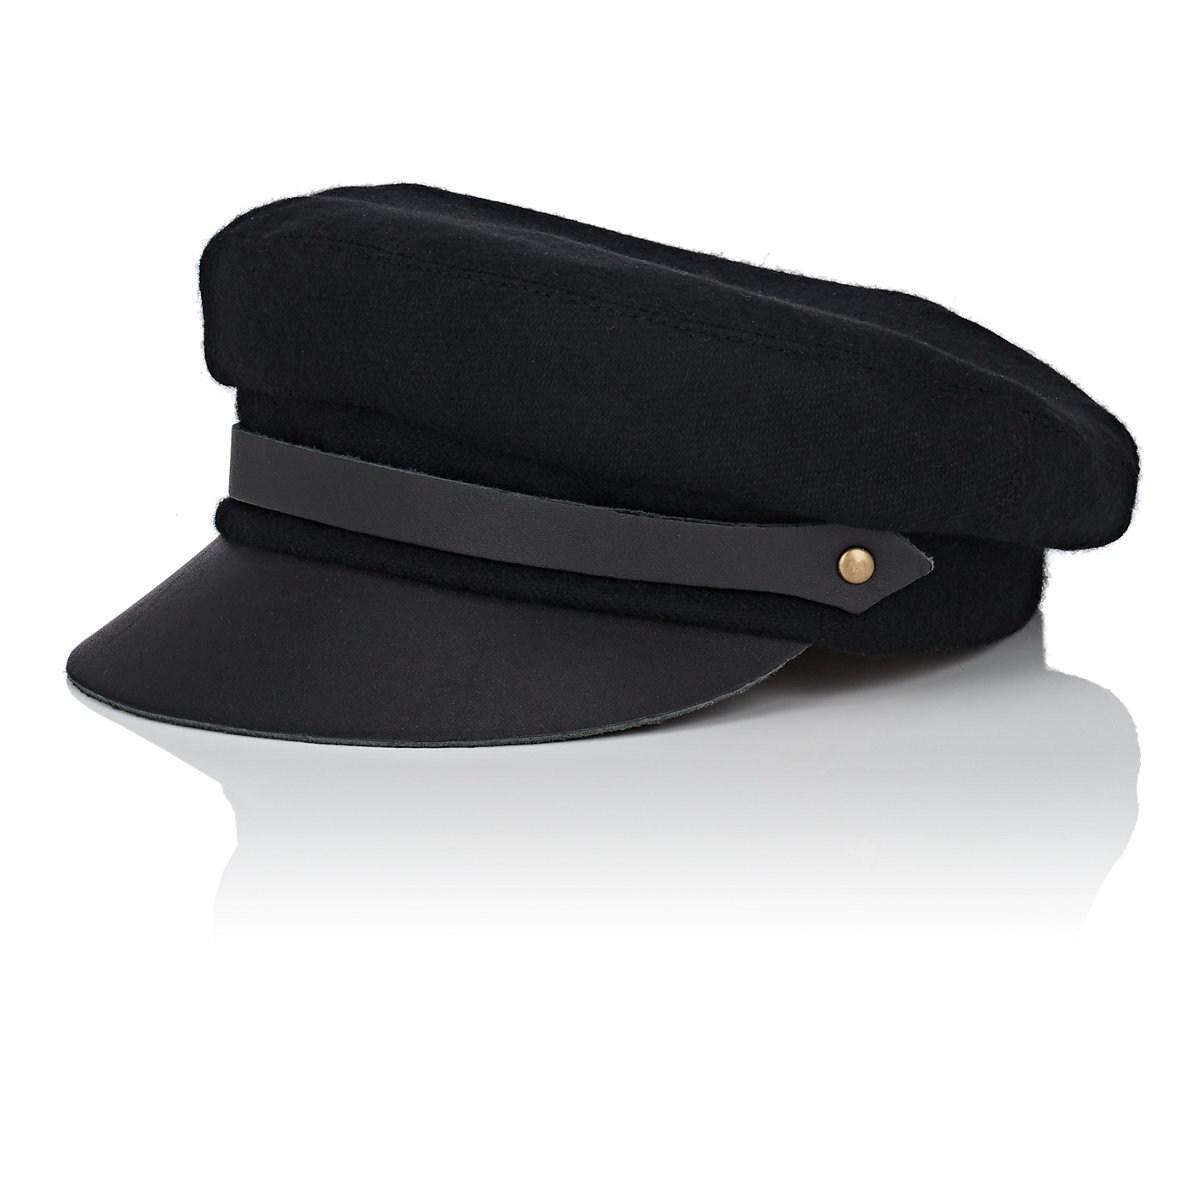 6540605c74ec2 Lola Hats Classic Chauffeur Hat in Black - Lyst